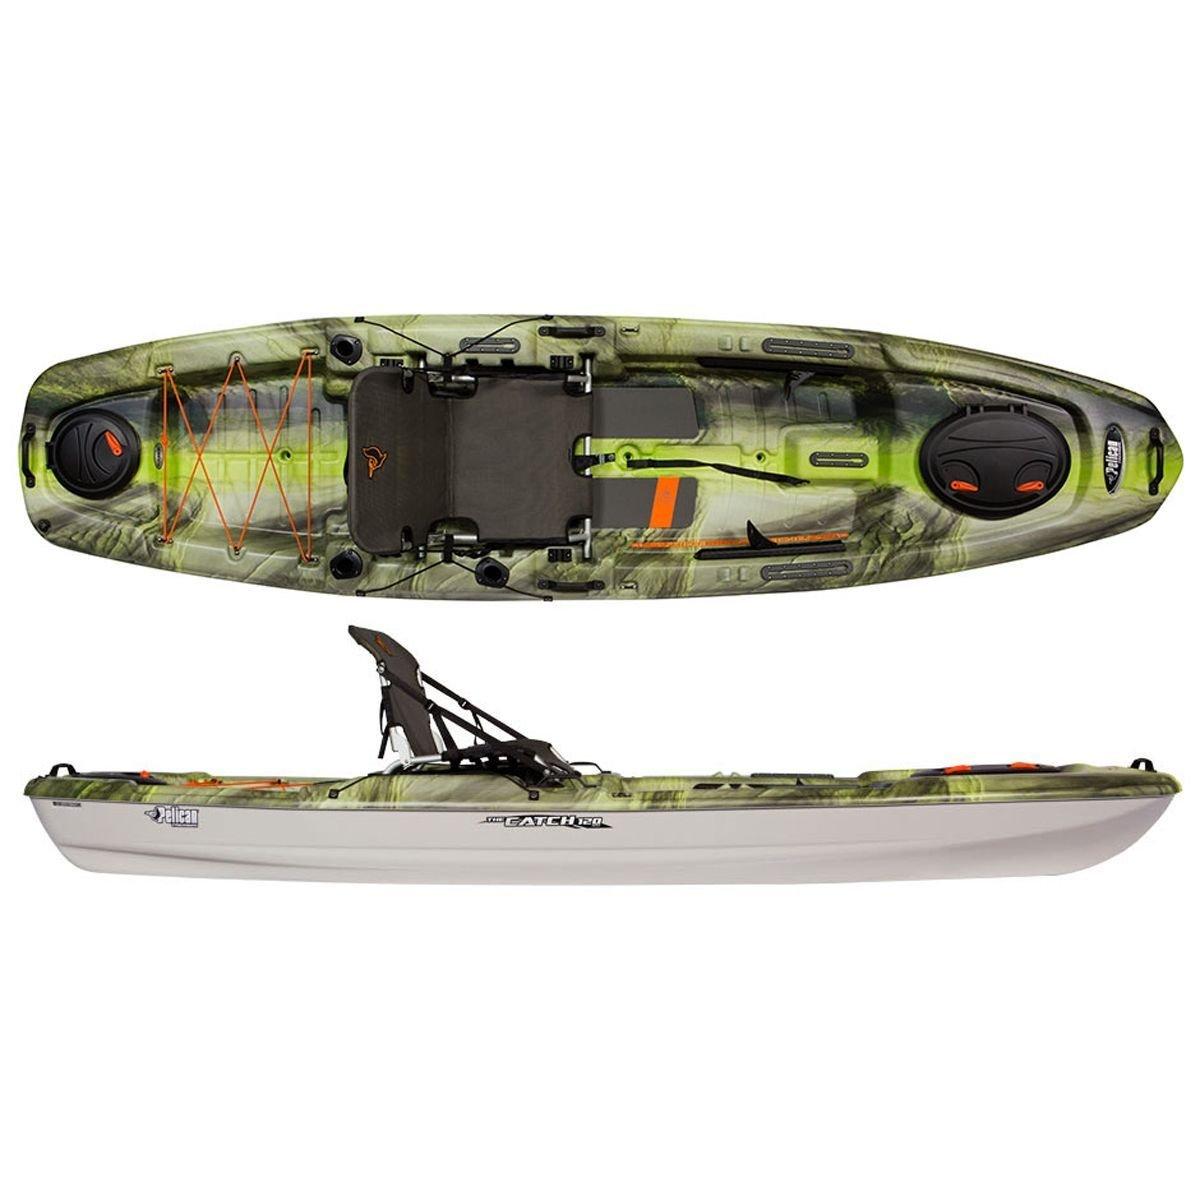 Amazon com : Pelican Sport The Catch 120NXT Kayak - Fade